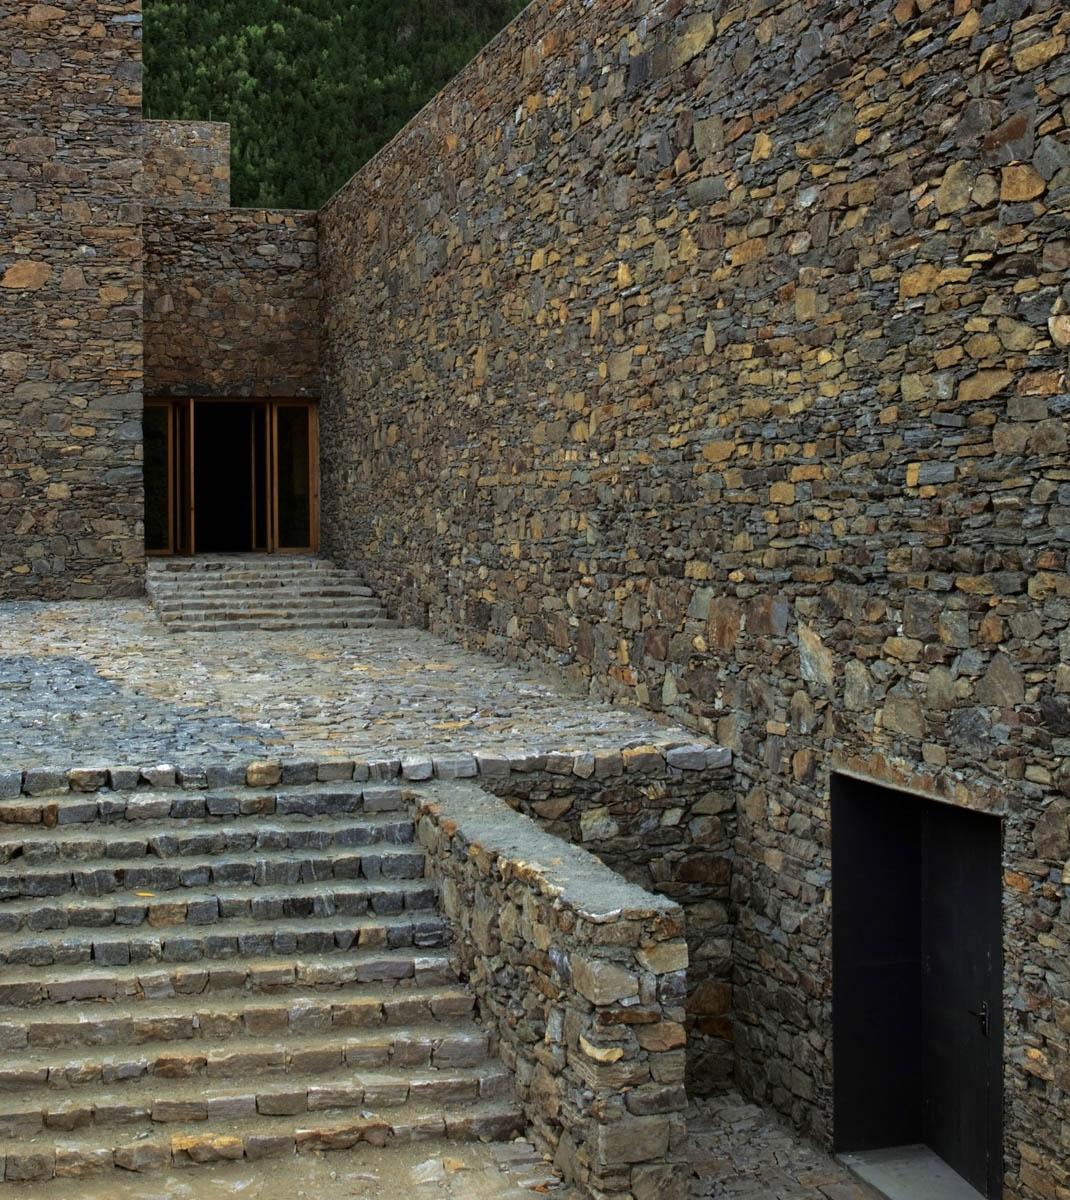 Zhang Ke tibet namcha barwa visitor centre 02 1070x1200 c